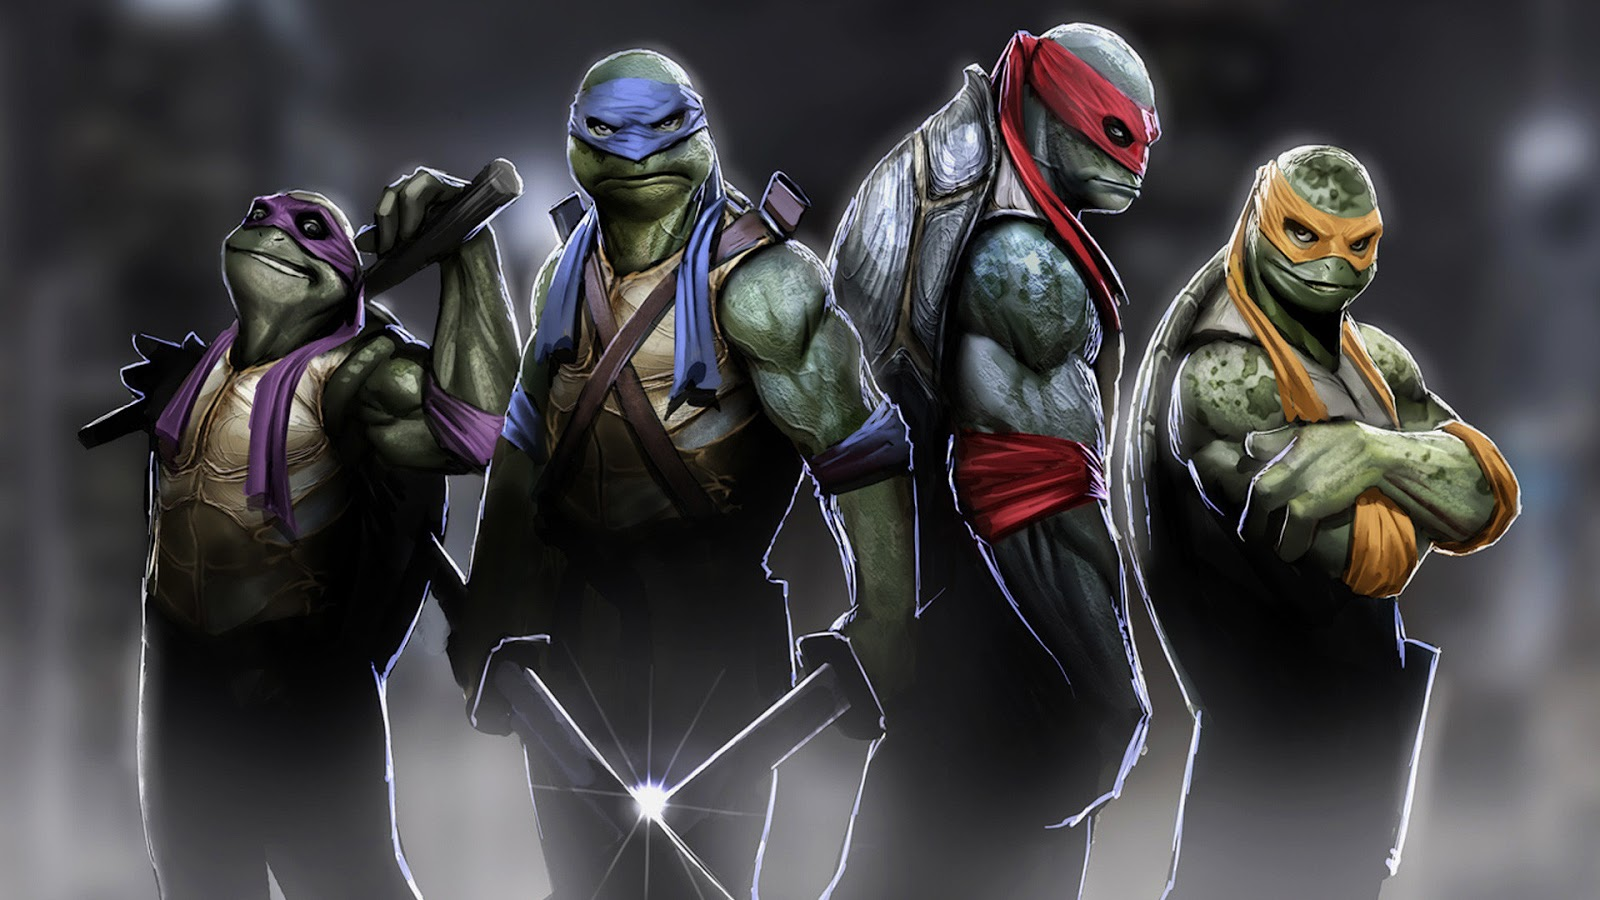 FanFic Gala Ensemble: Teenage Mutant Ninja Turtles